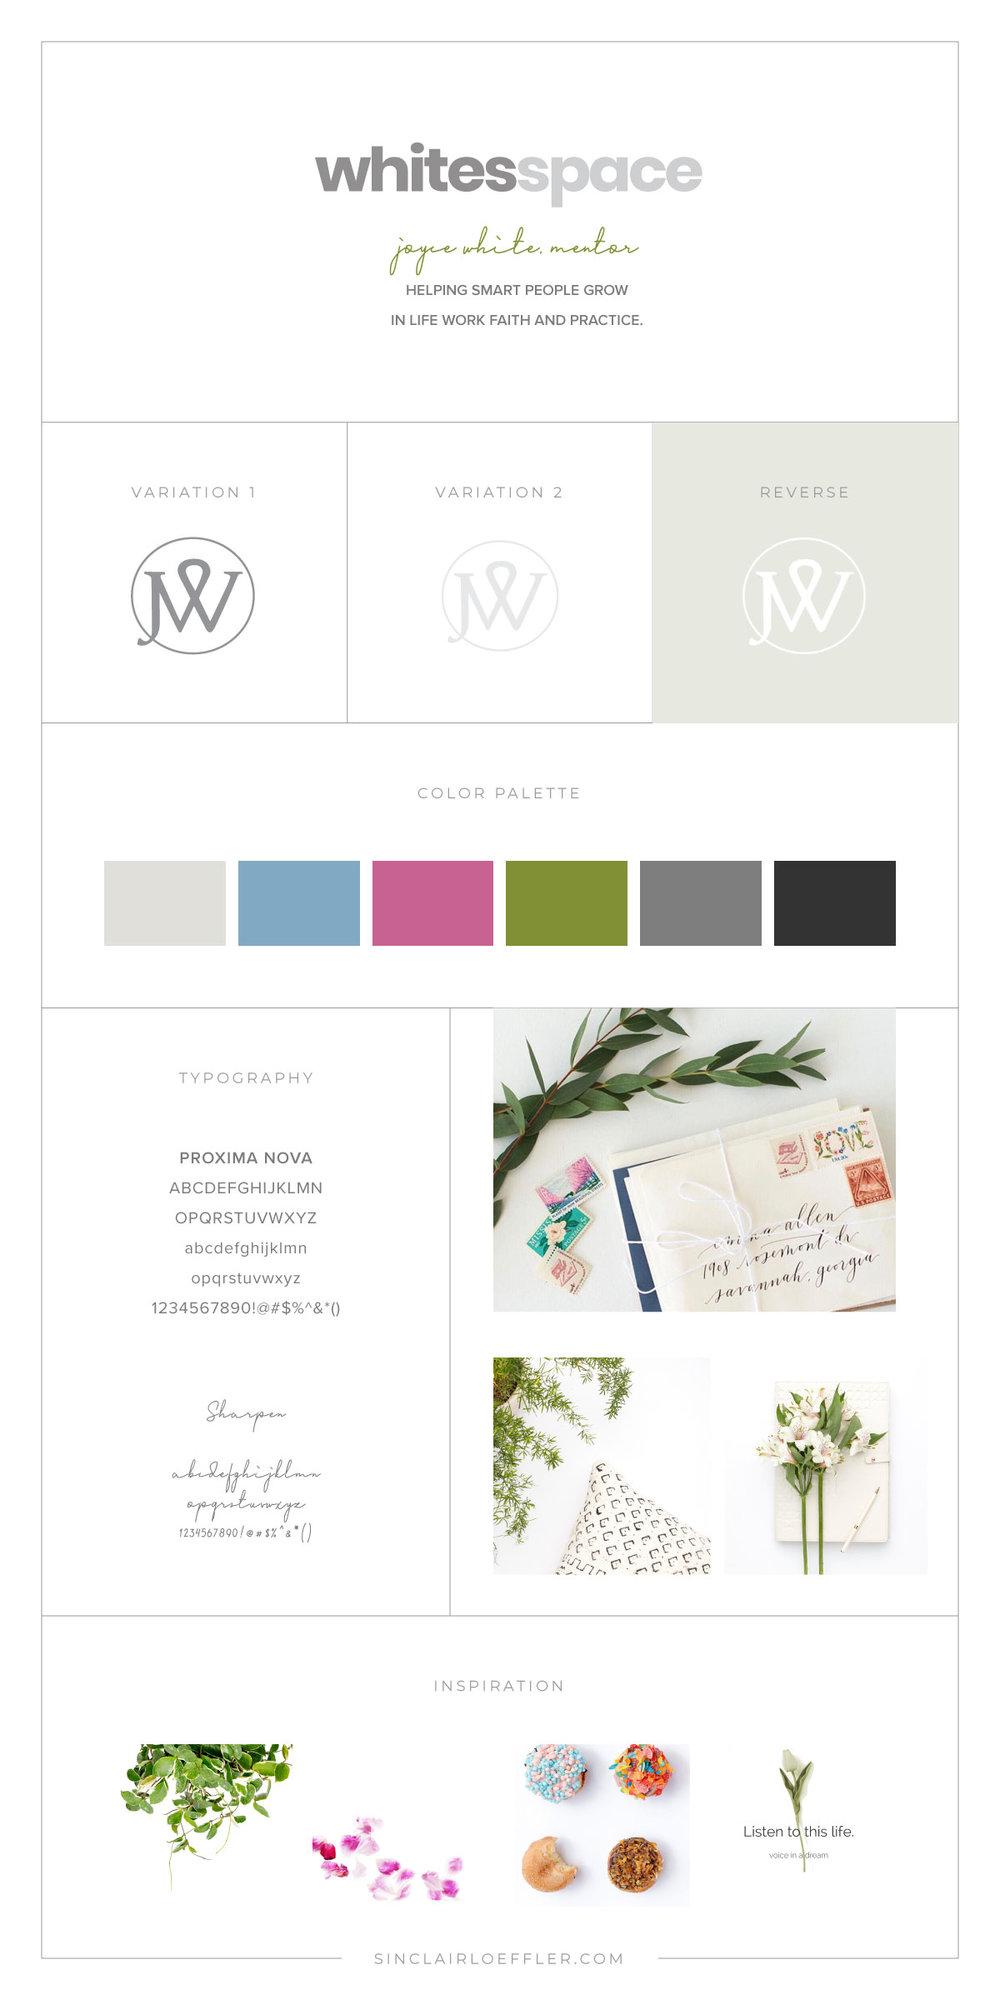 brand-board---style-tile-2-joyce-white.jpg